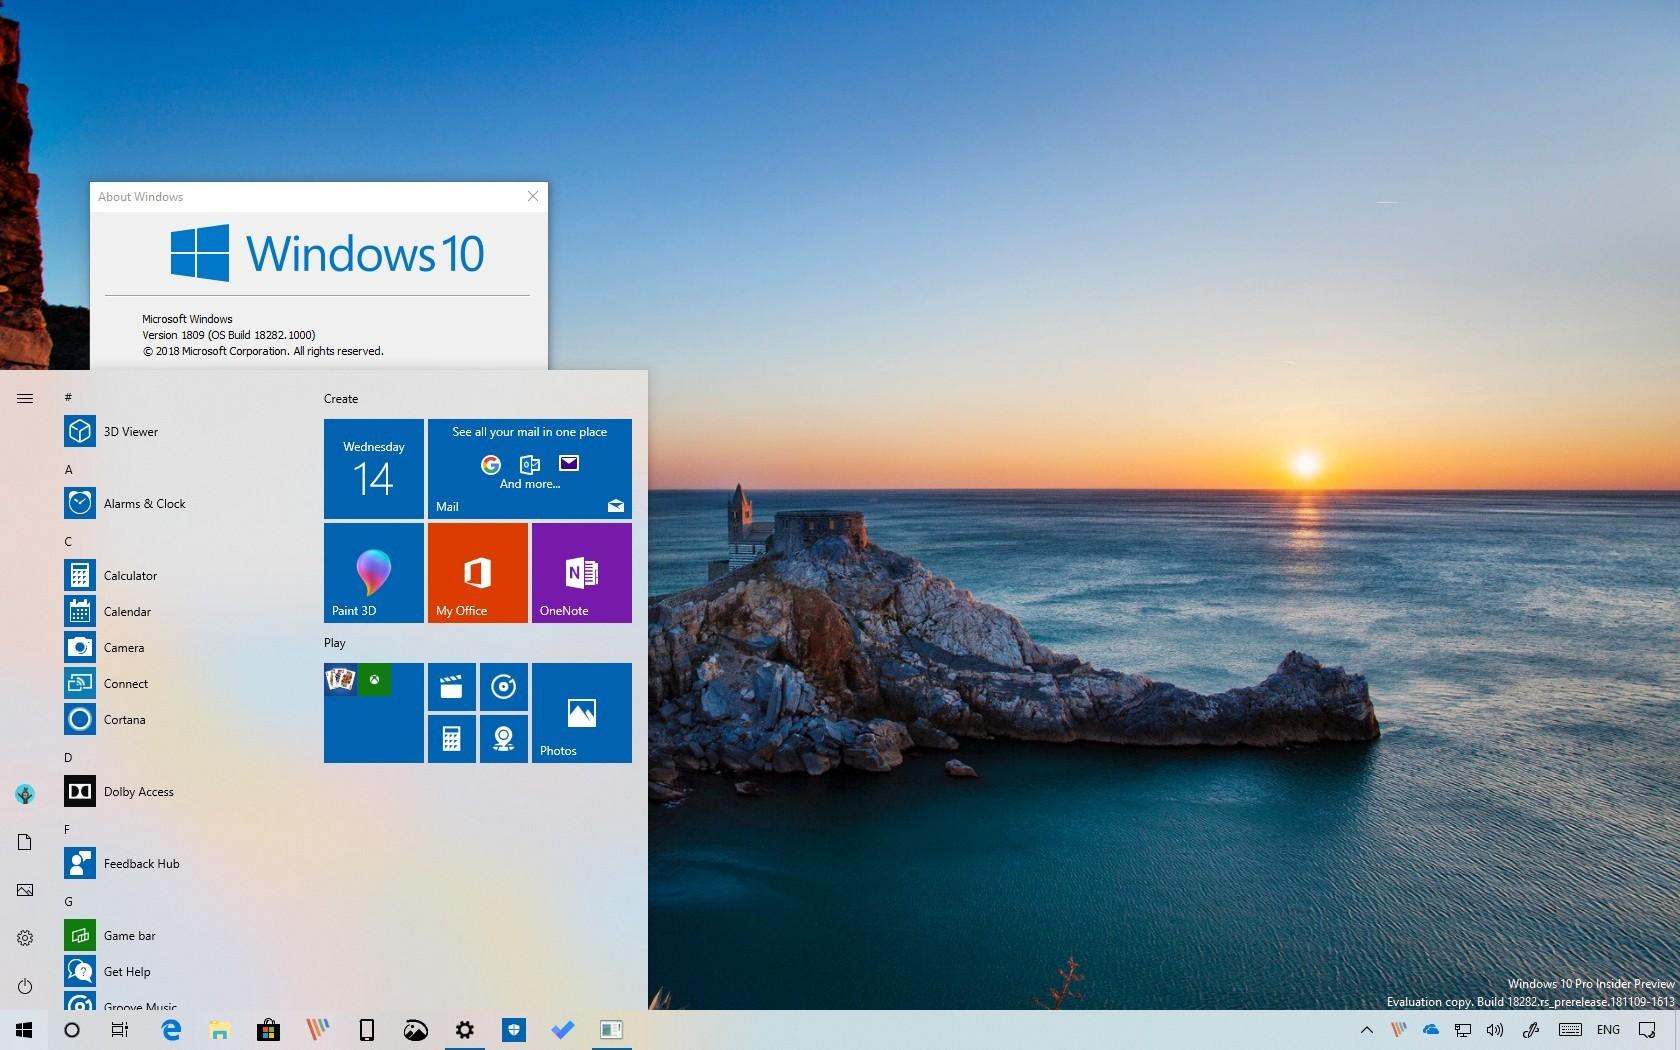 Windows 10 build 18282